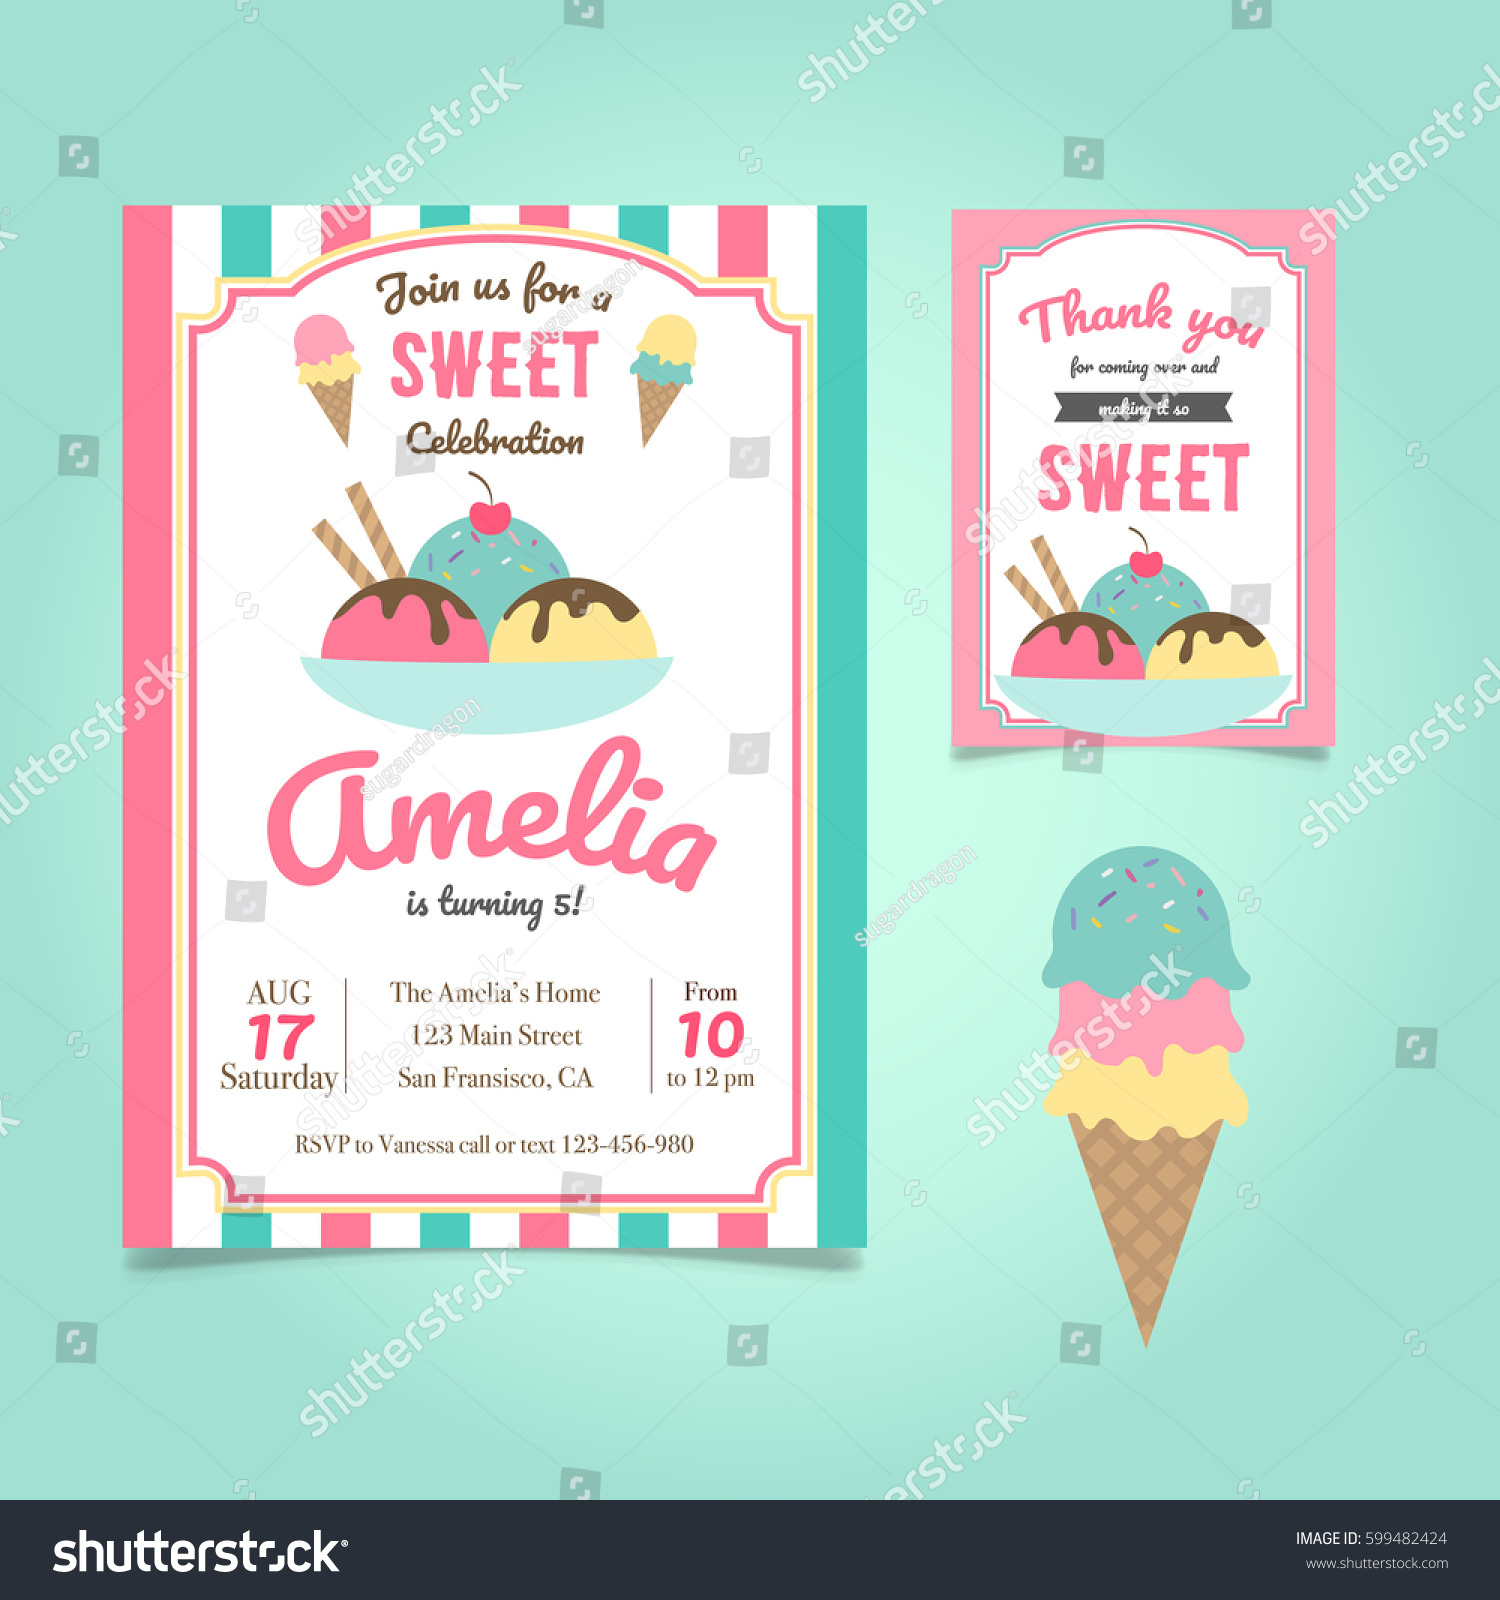 Ice Cream Party Birthday Invitation Template Stock Vector ...